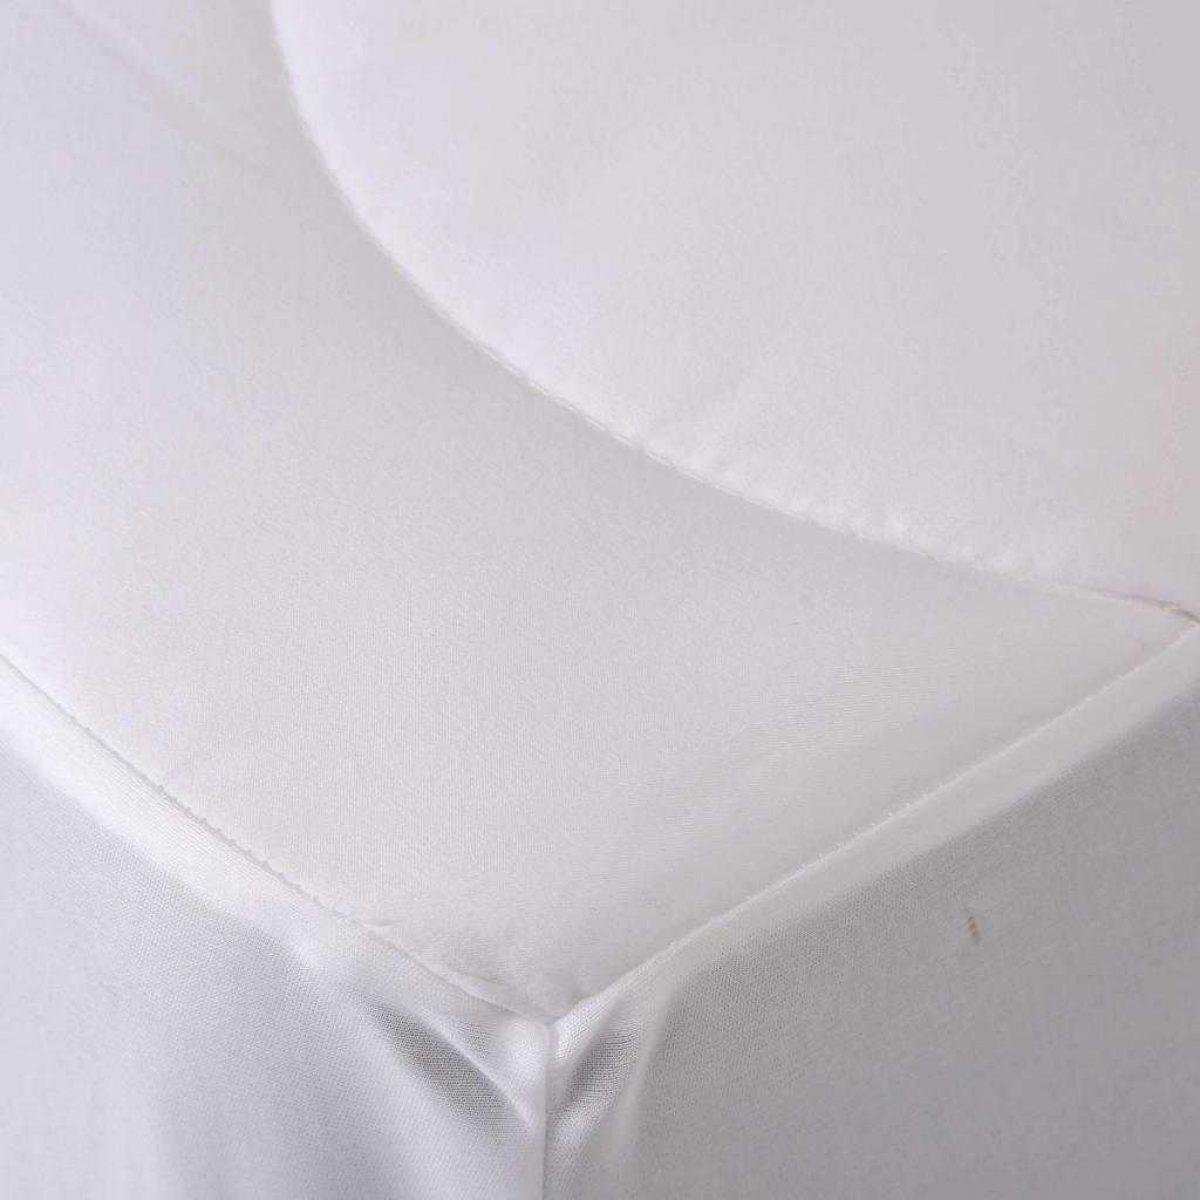 Fine Bedding Spundown Mattress Protector Detail 1024x1024